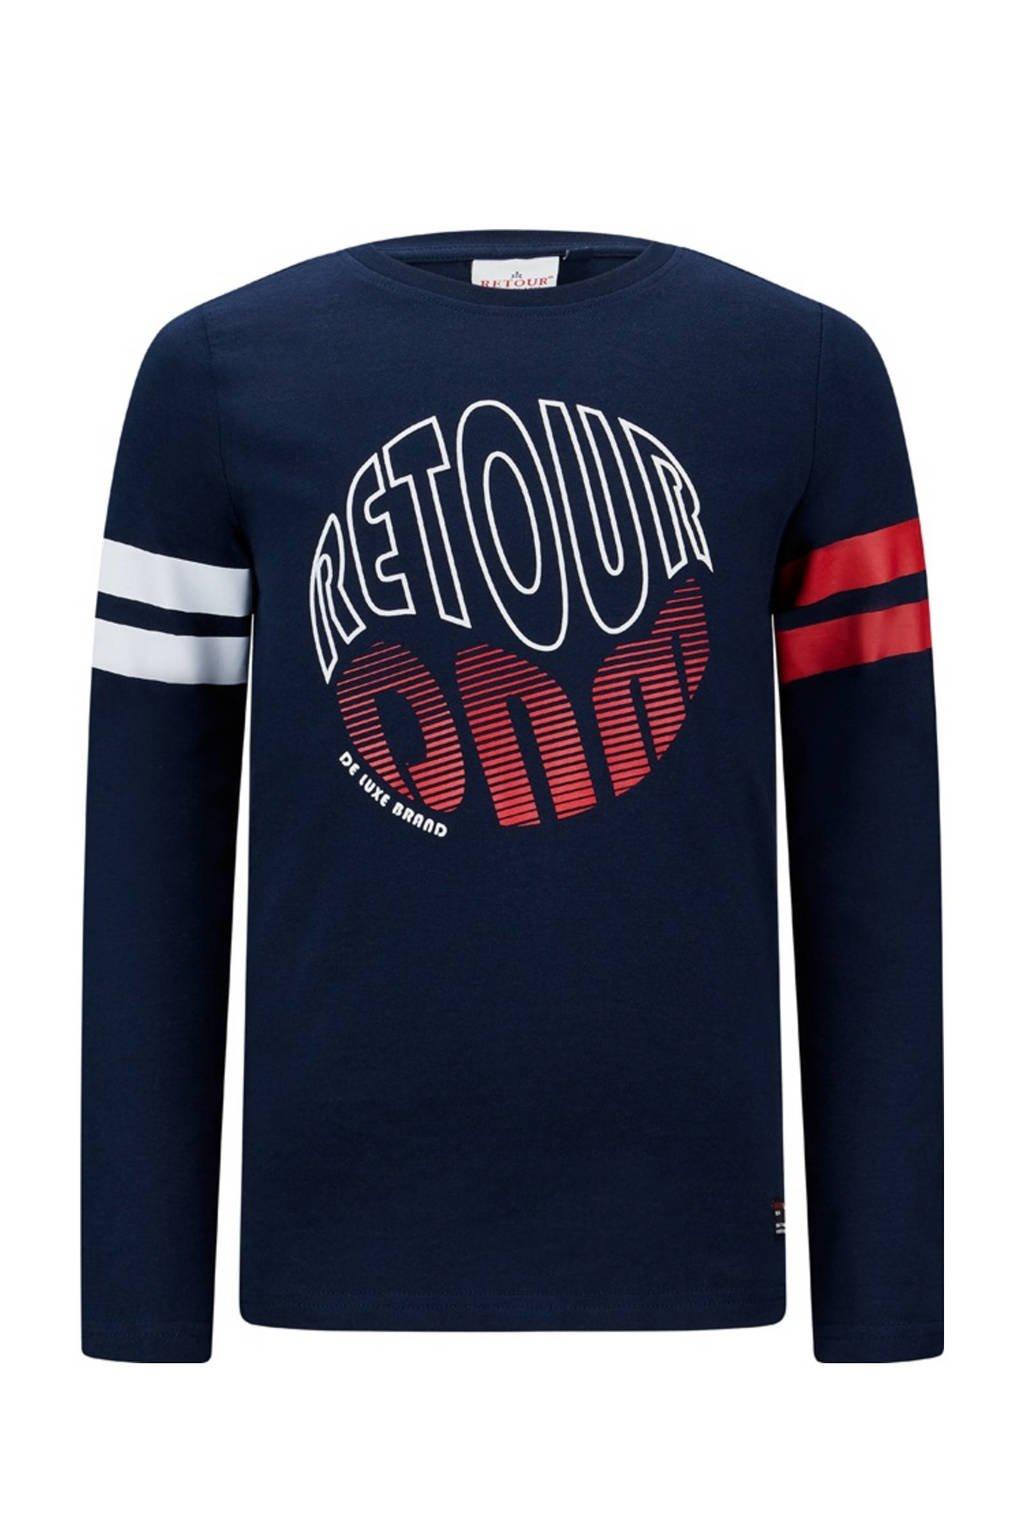 Retour Denim longsleeve Bas met logo donkerblauw/wit/rood, Donkerblauw/wit/rood